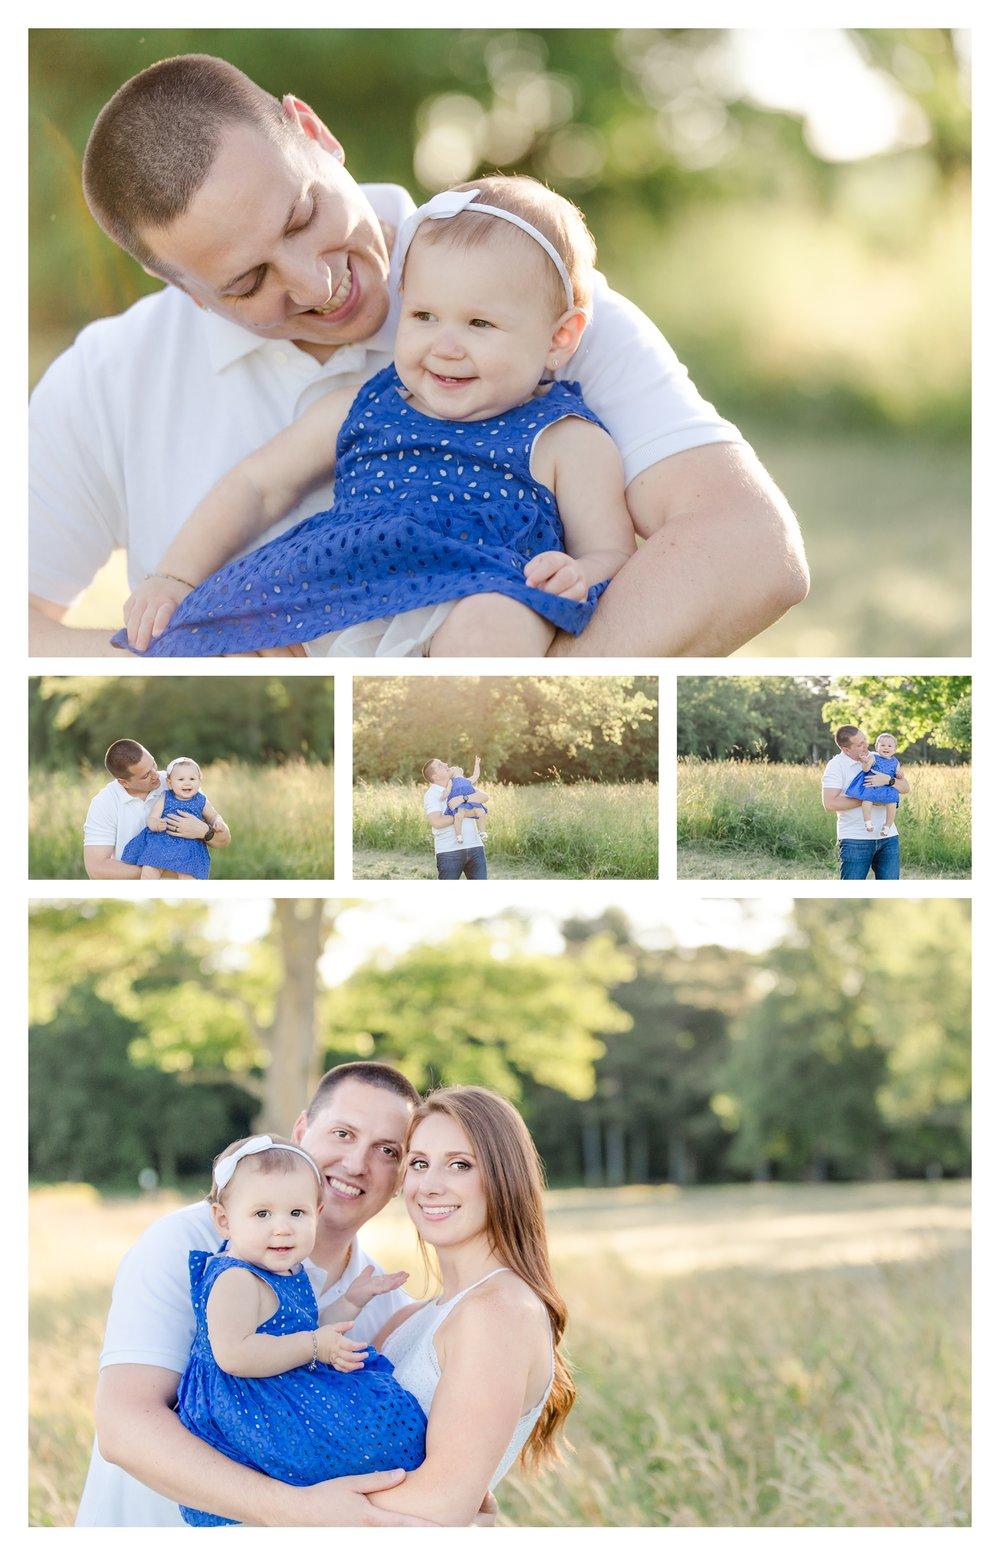 familyphotographer-fairfieldcountyct-kristinwoodphotography.jpg